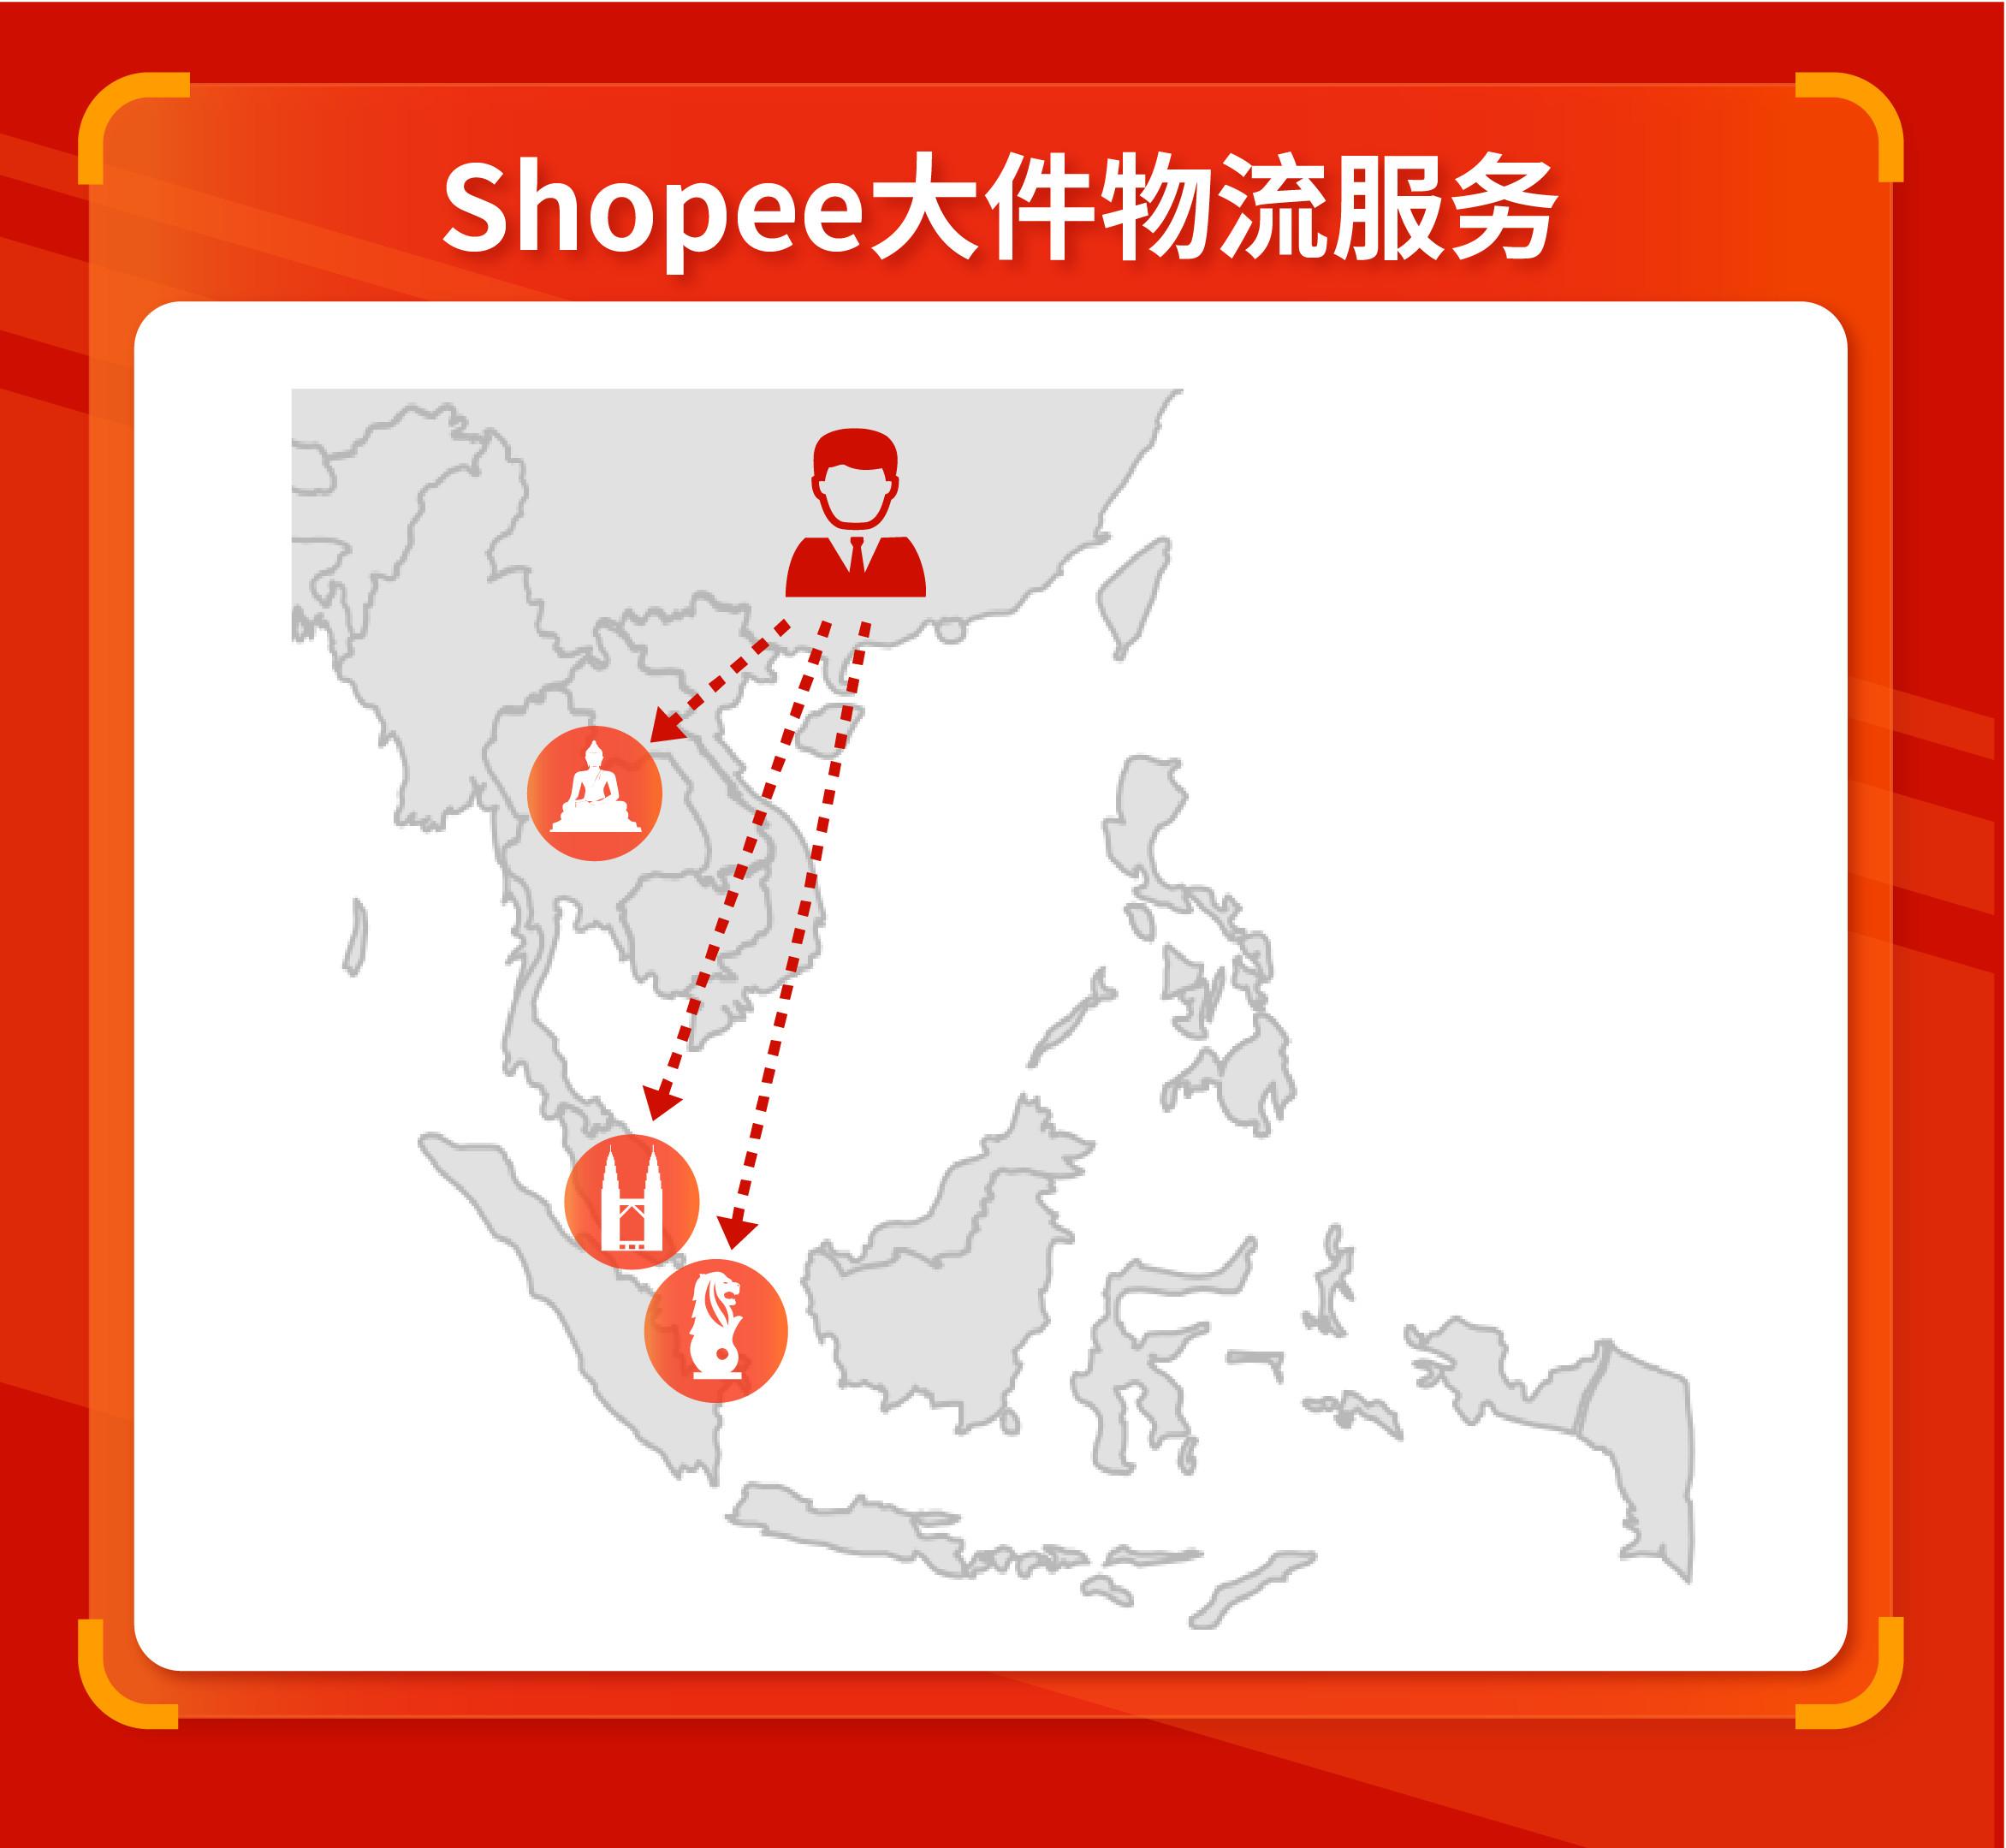 Shopee大件物流服务介绍.jpg